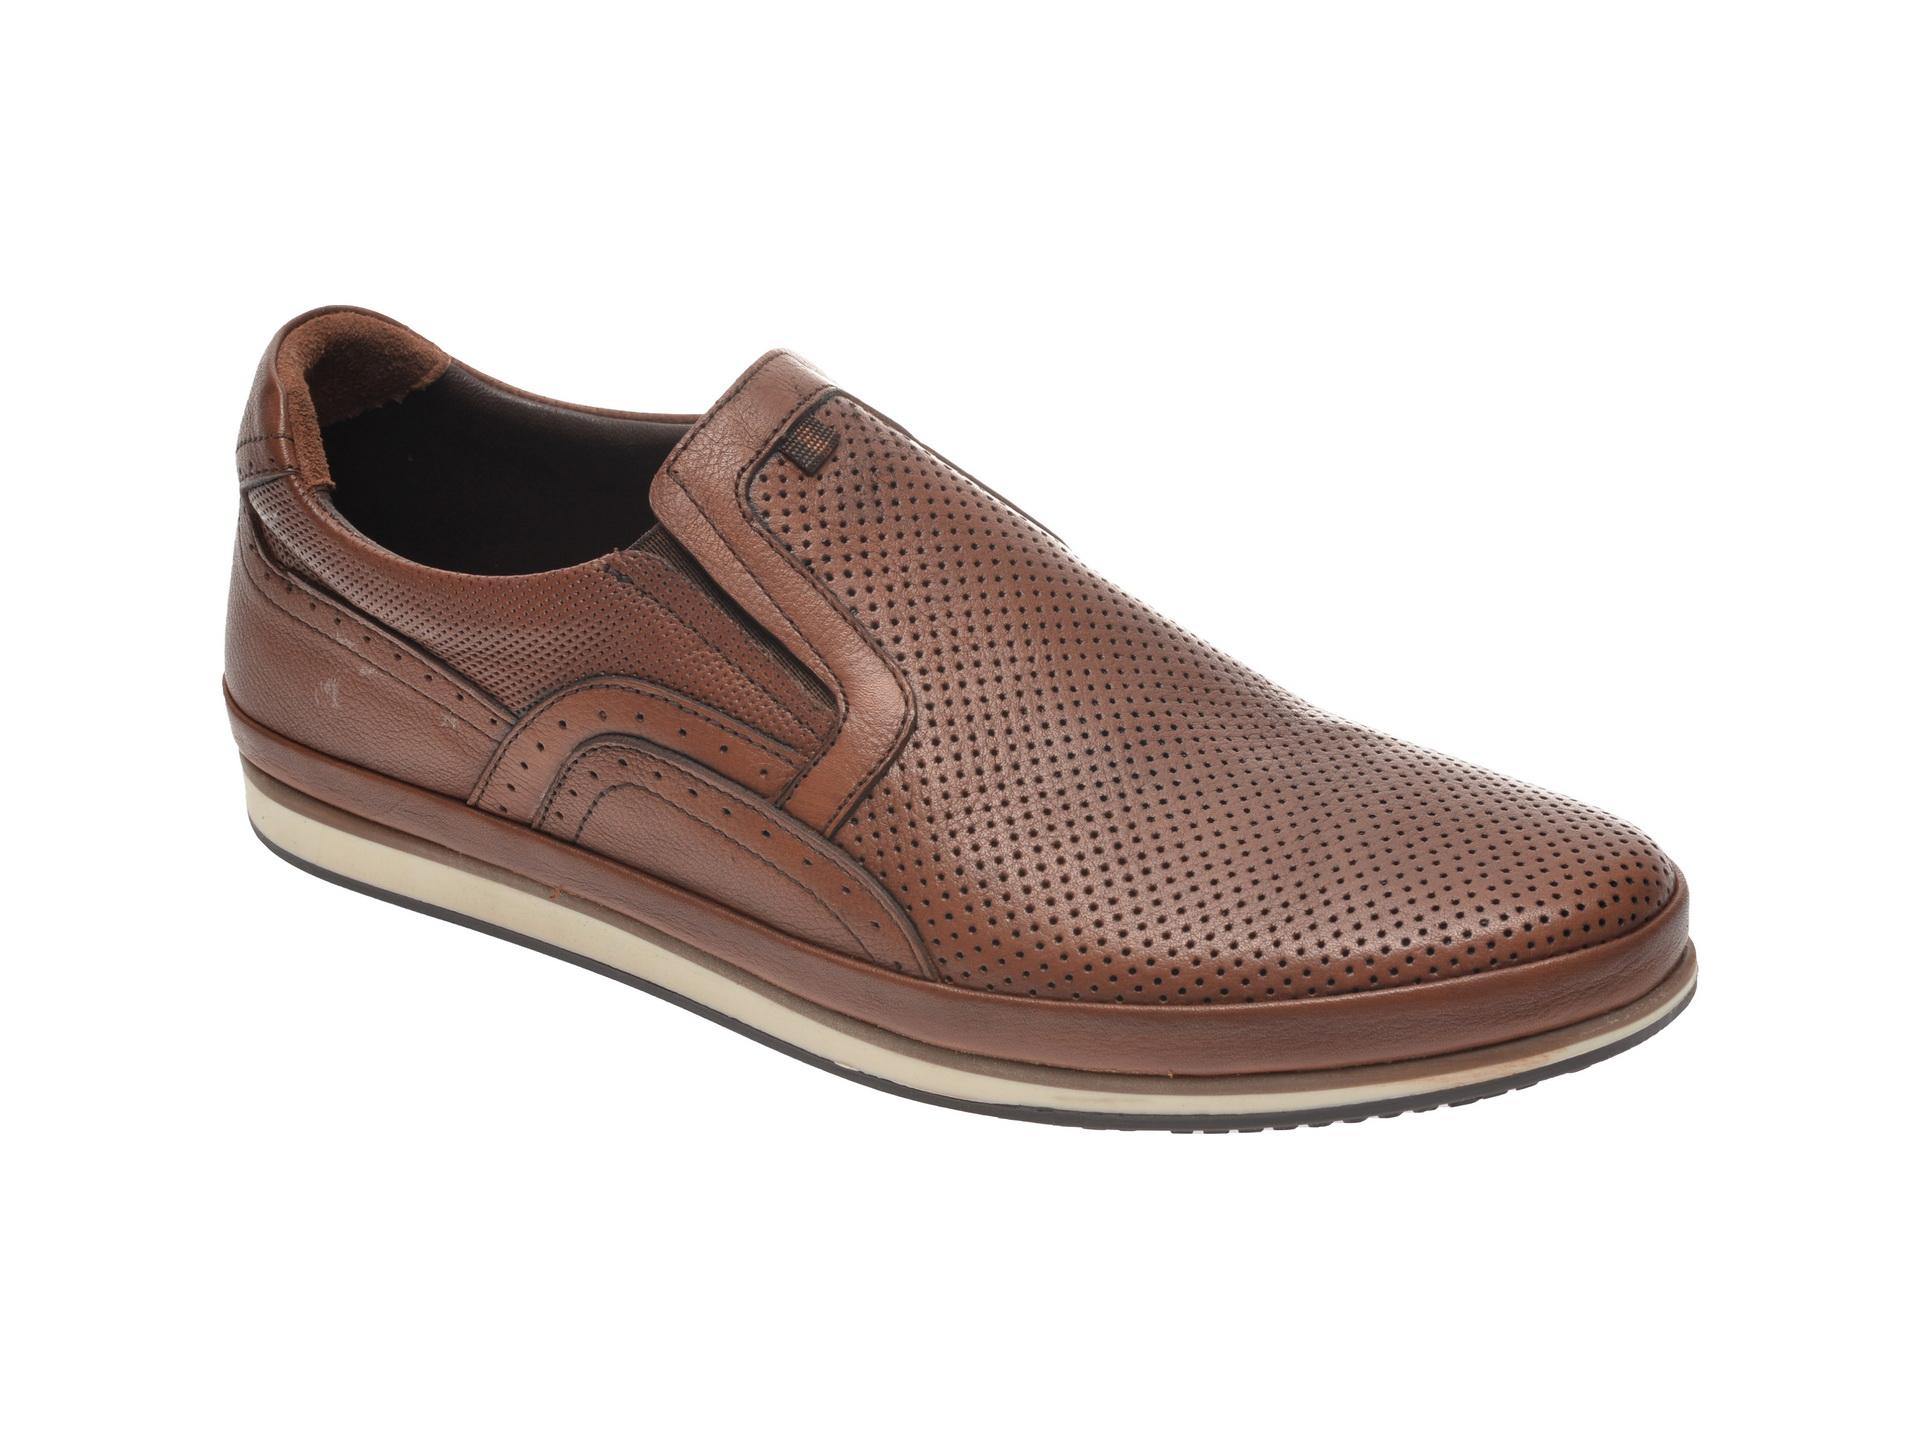 Pantofi OTTER maro, M5500, din piele naturala